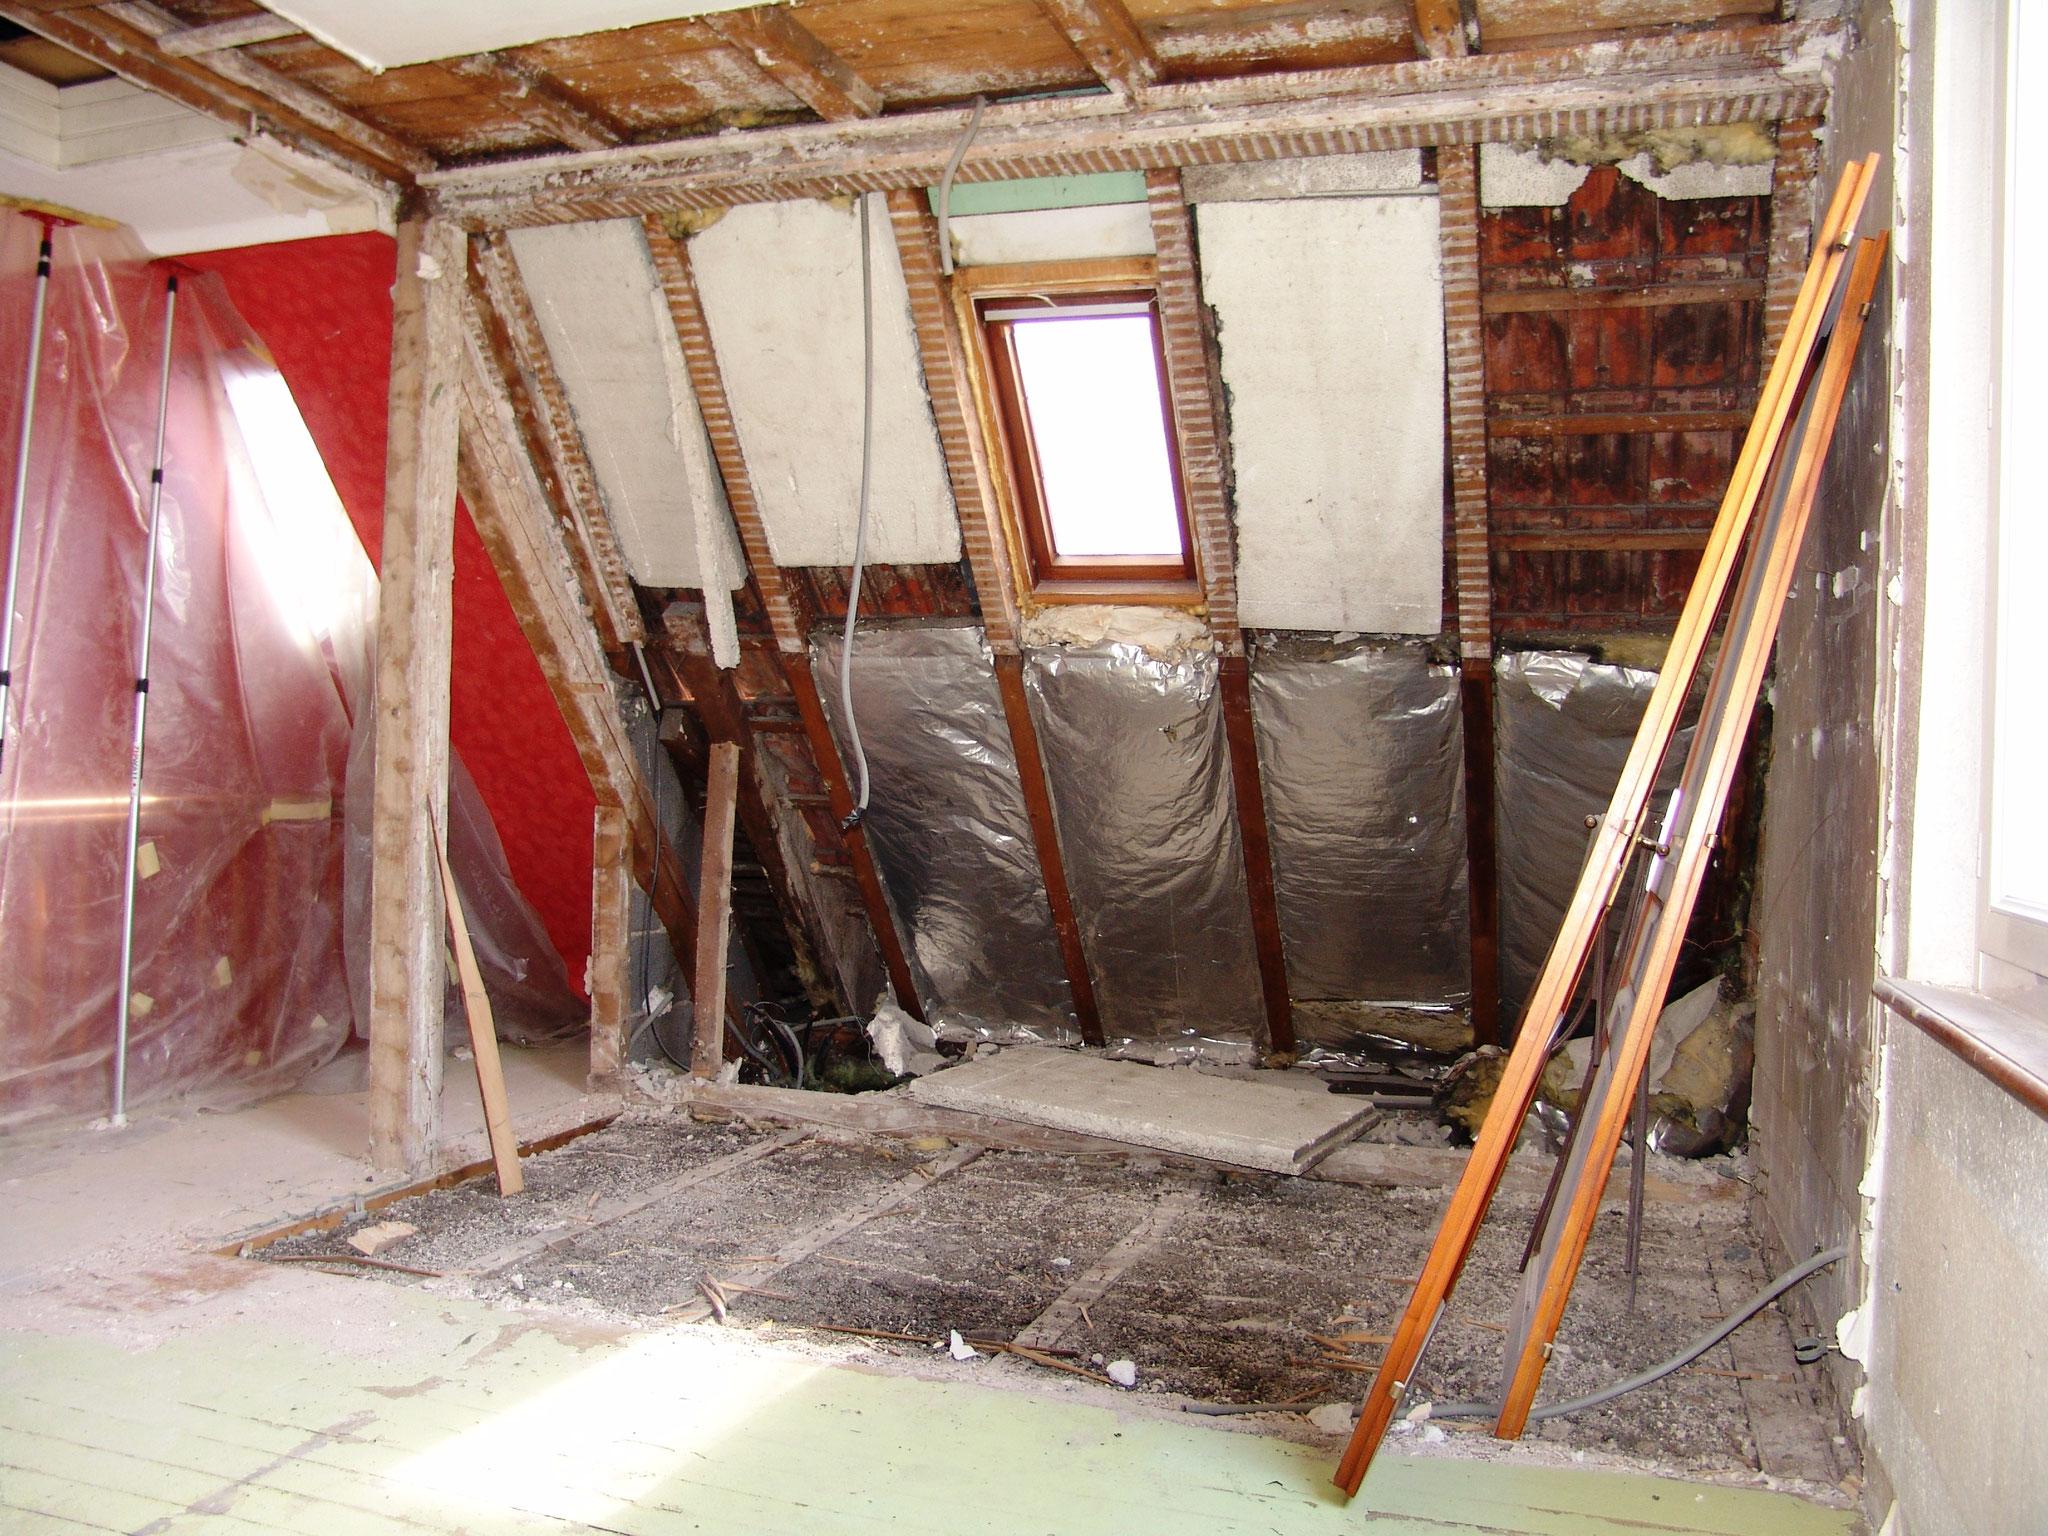 Abattage du mur, démolition de rampant plafond et enlever anciens planchers en bois Illkirch-Graffenstaden 67